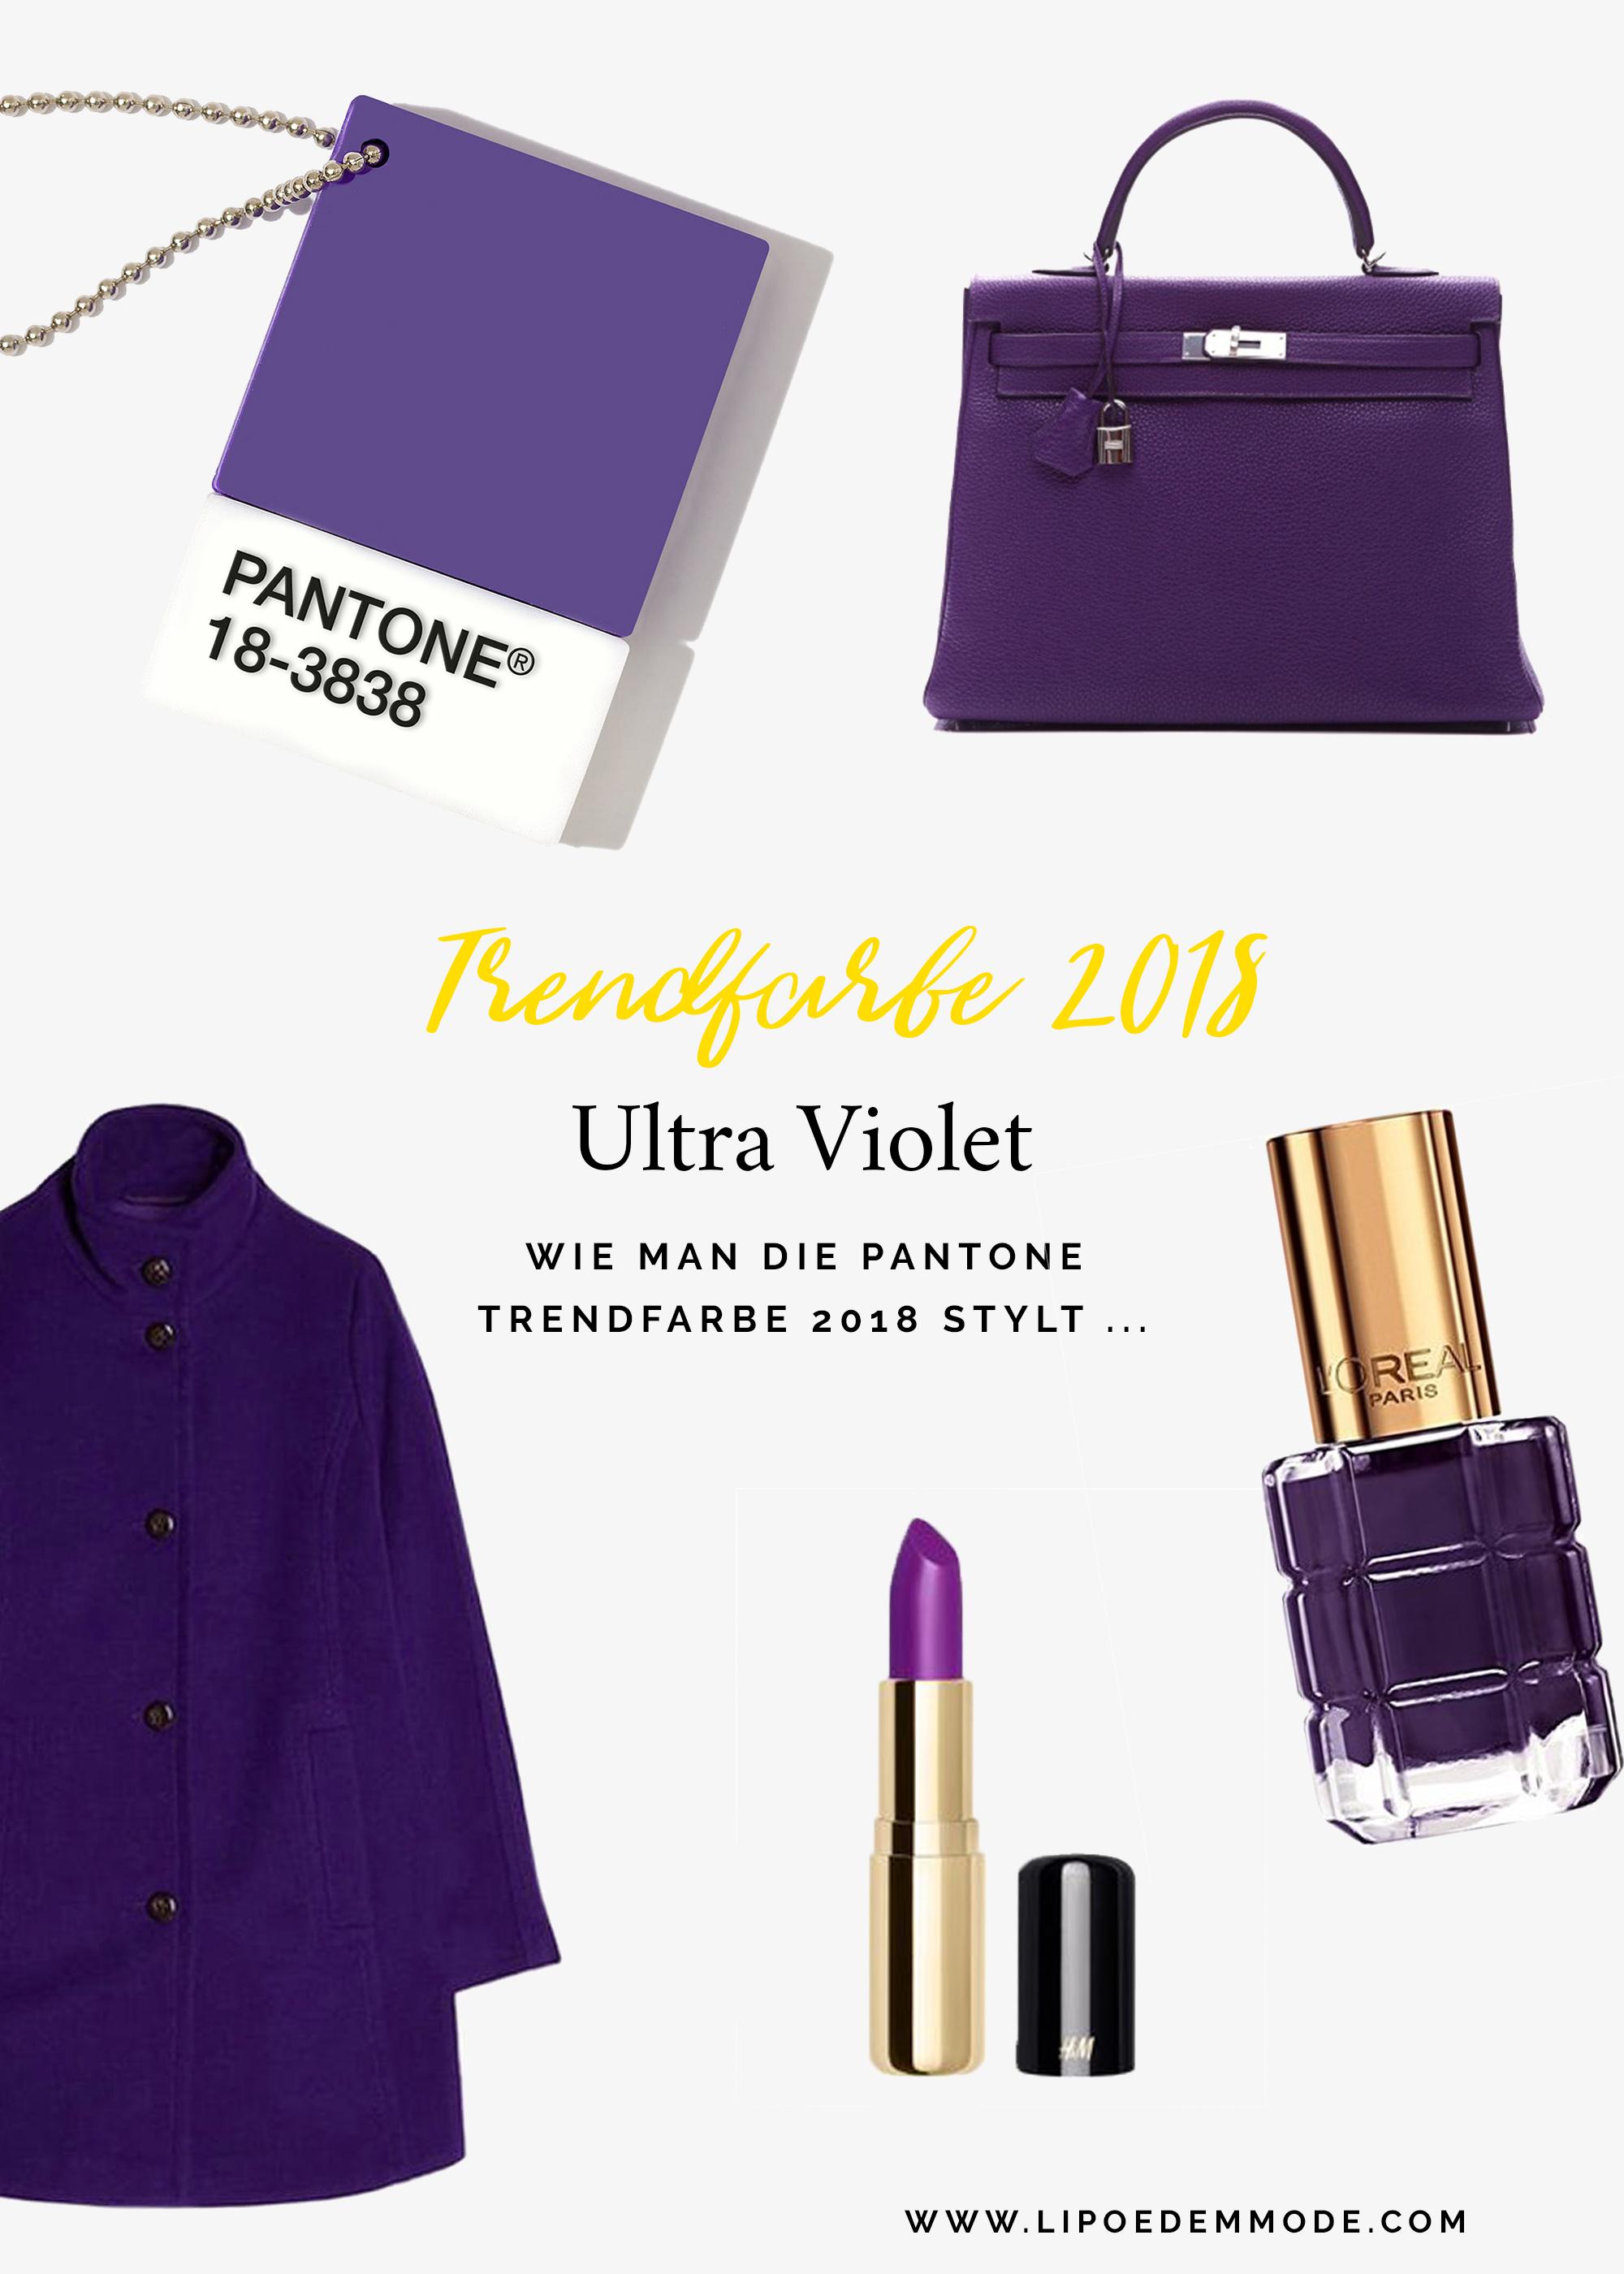 moodboad Ultra Violet ultraviolet lipoedem mode trendfarbe 2018 style mood nagellack lippenstift nail color colour lipstick bag purse handtasche mantel